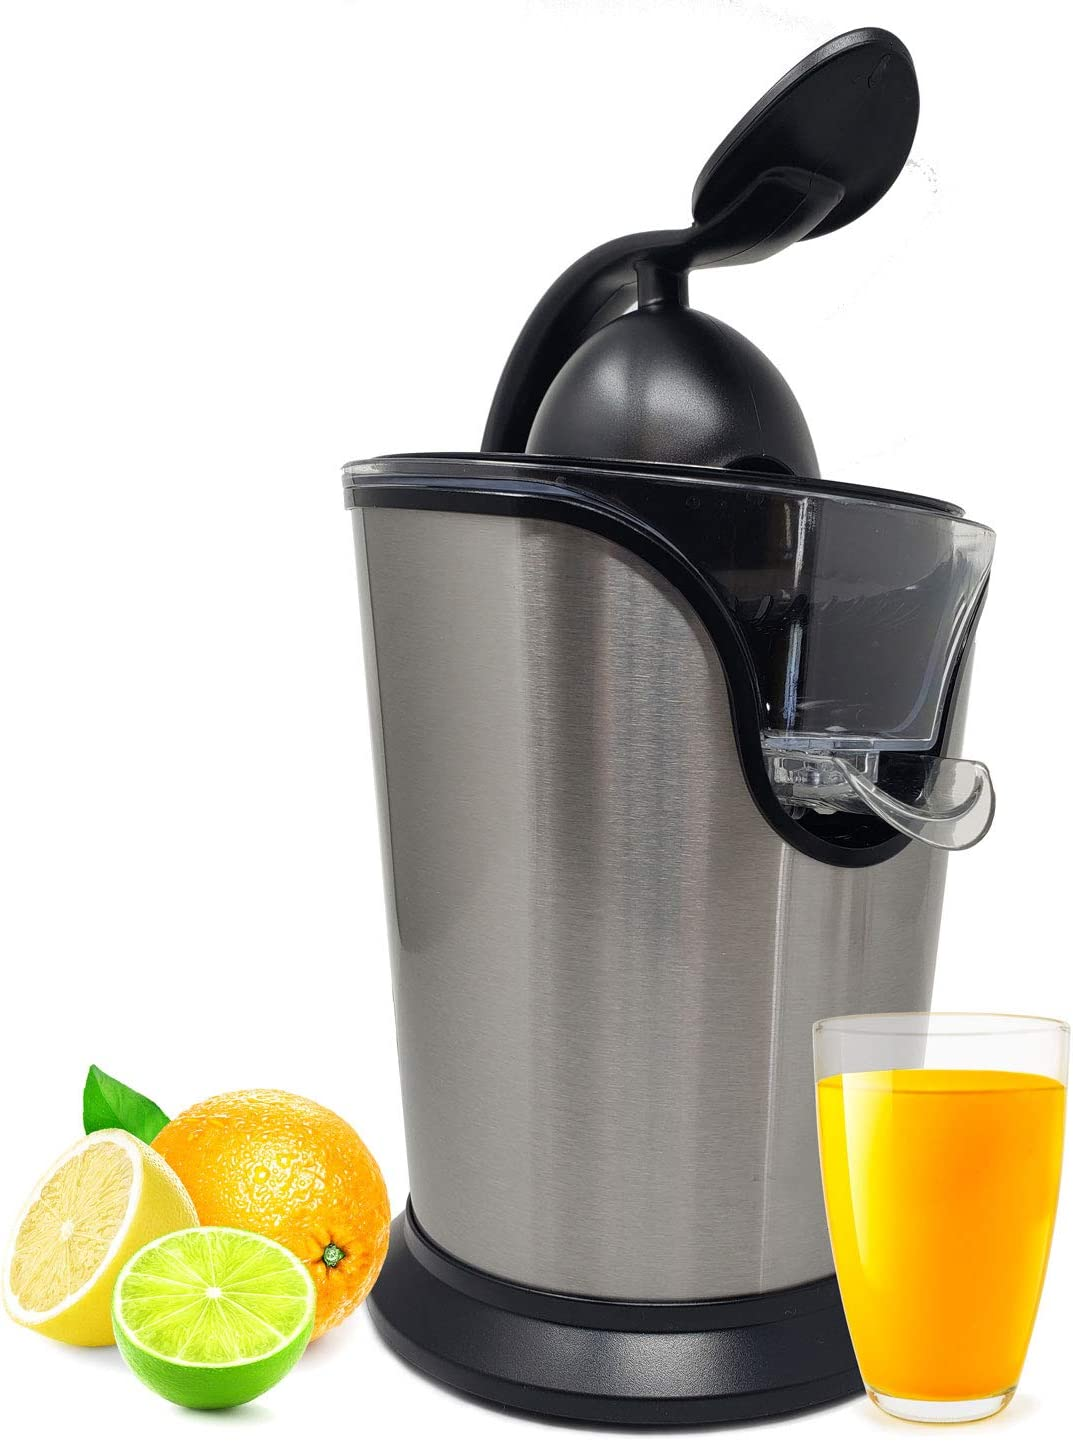 Electric Citrus Juicer Press Squeezer Stainless Steel Ultra Quiet & Super Duty 85 Watt Motor Anti Slip & No Drip For Orange & Lemon